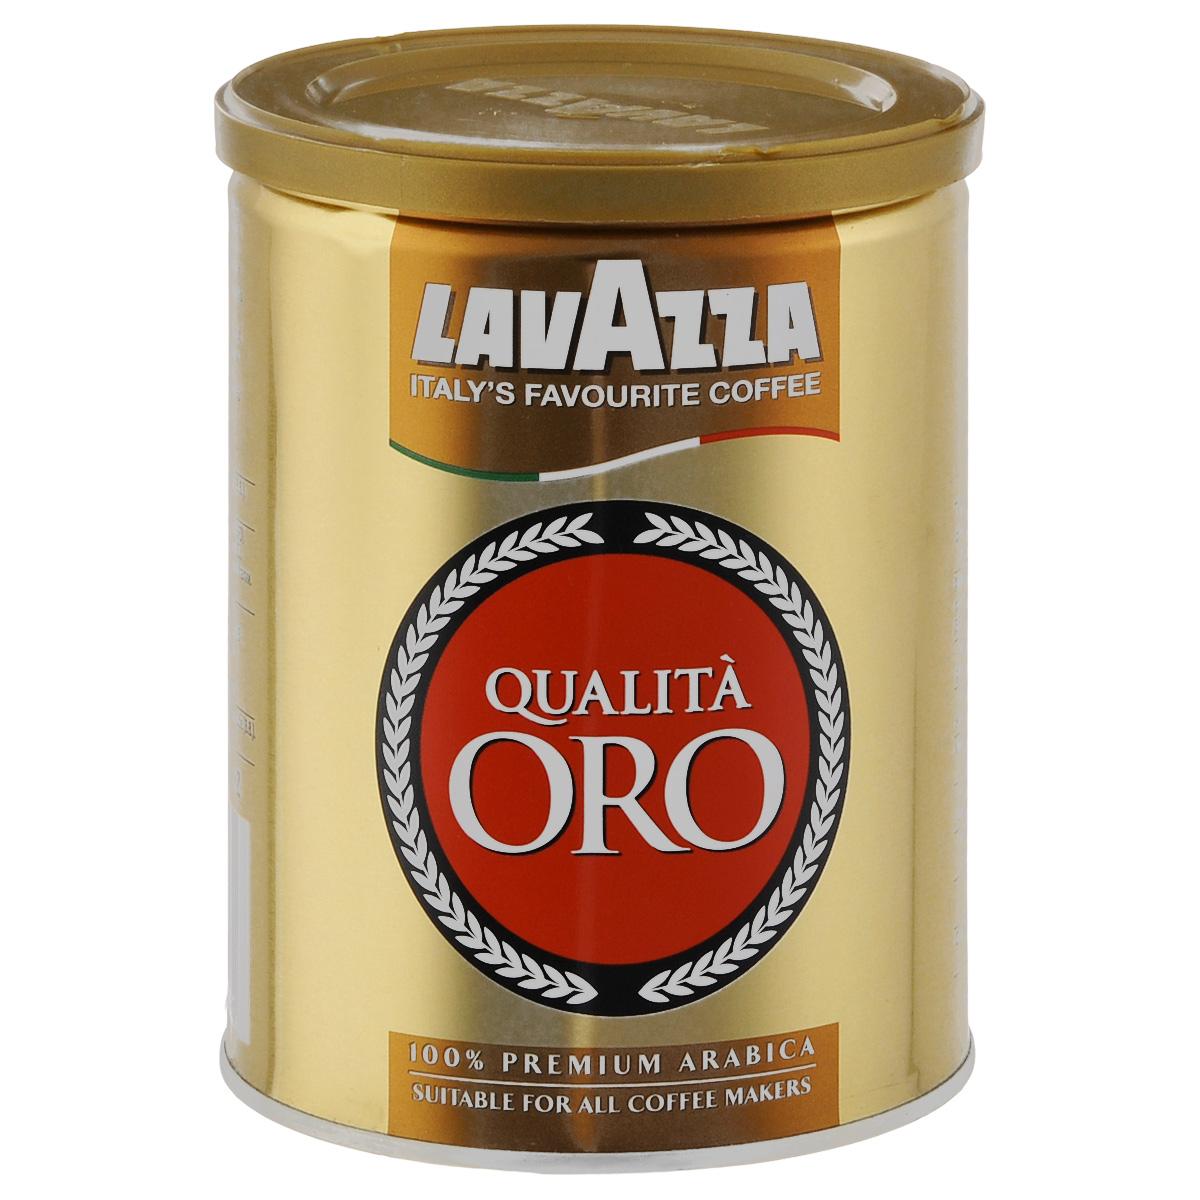 Lavazza Qualita Oro кофе молотый, 250 г carraro qualita oro 500 гр